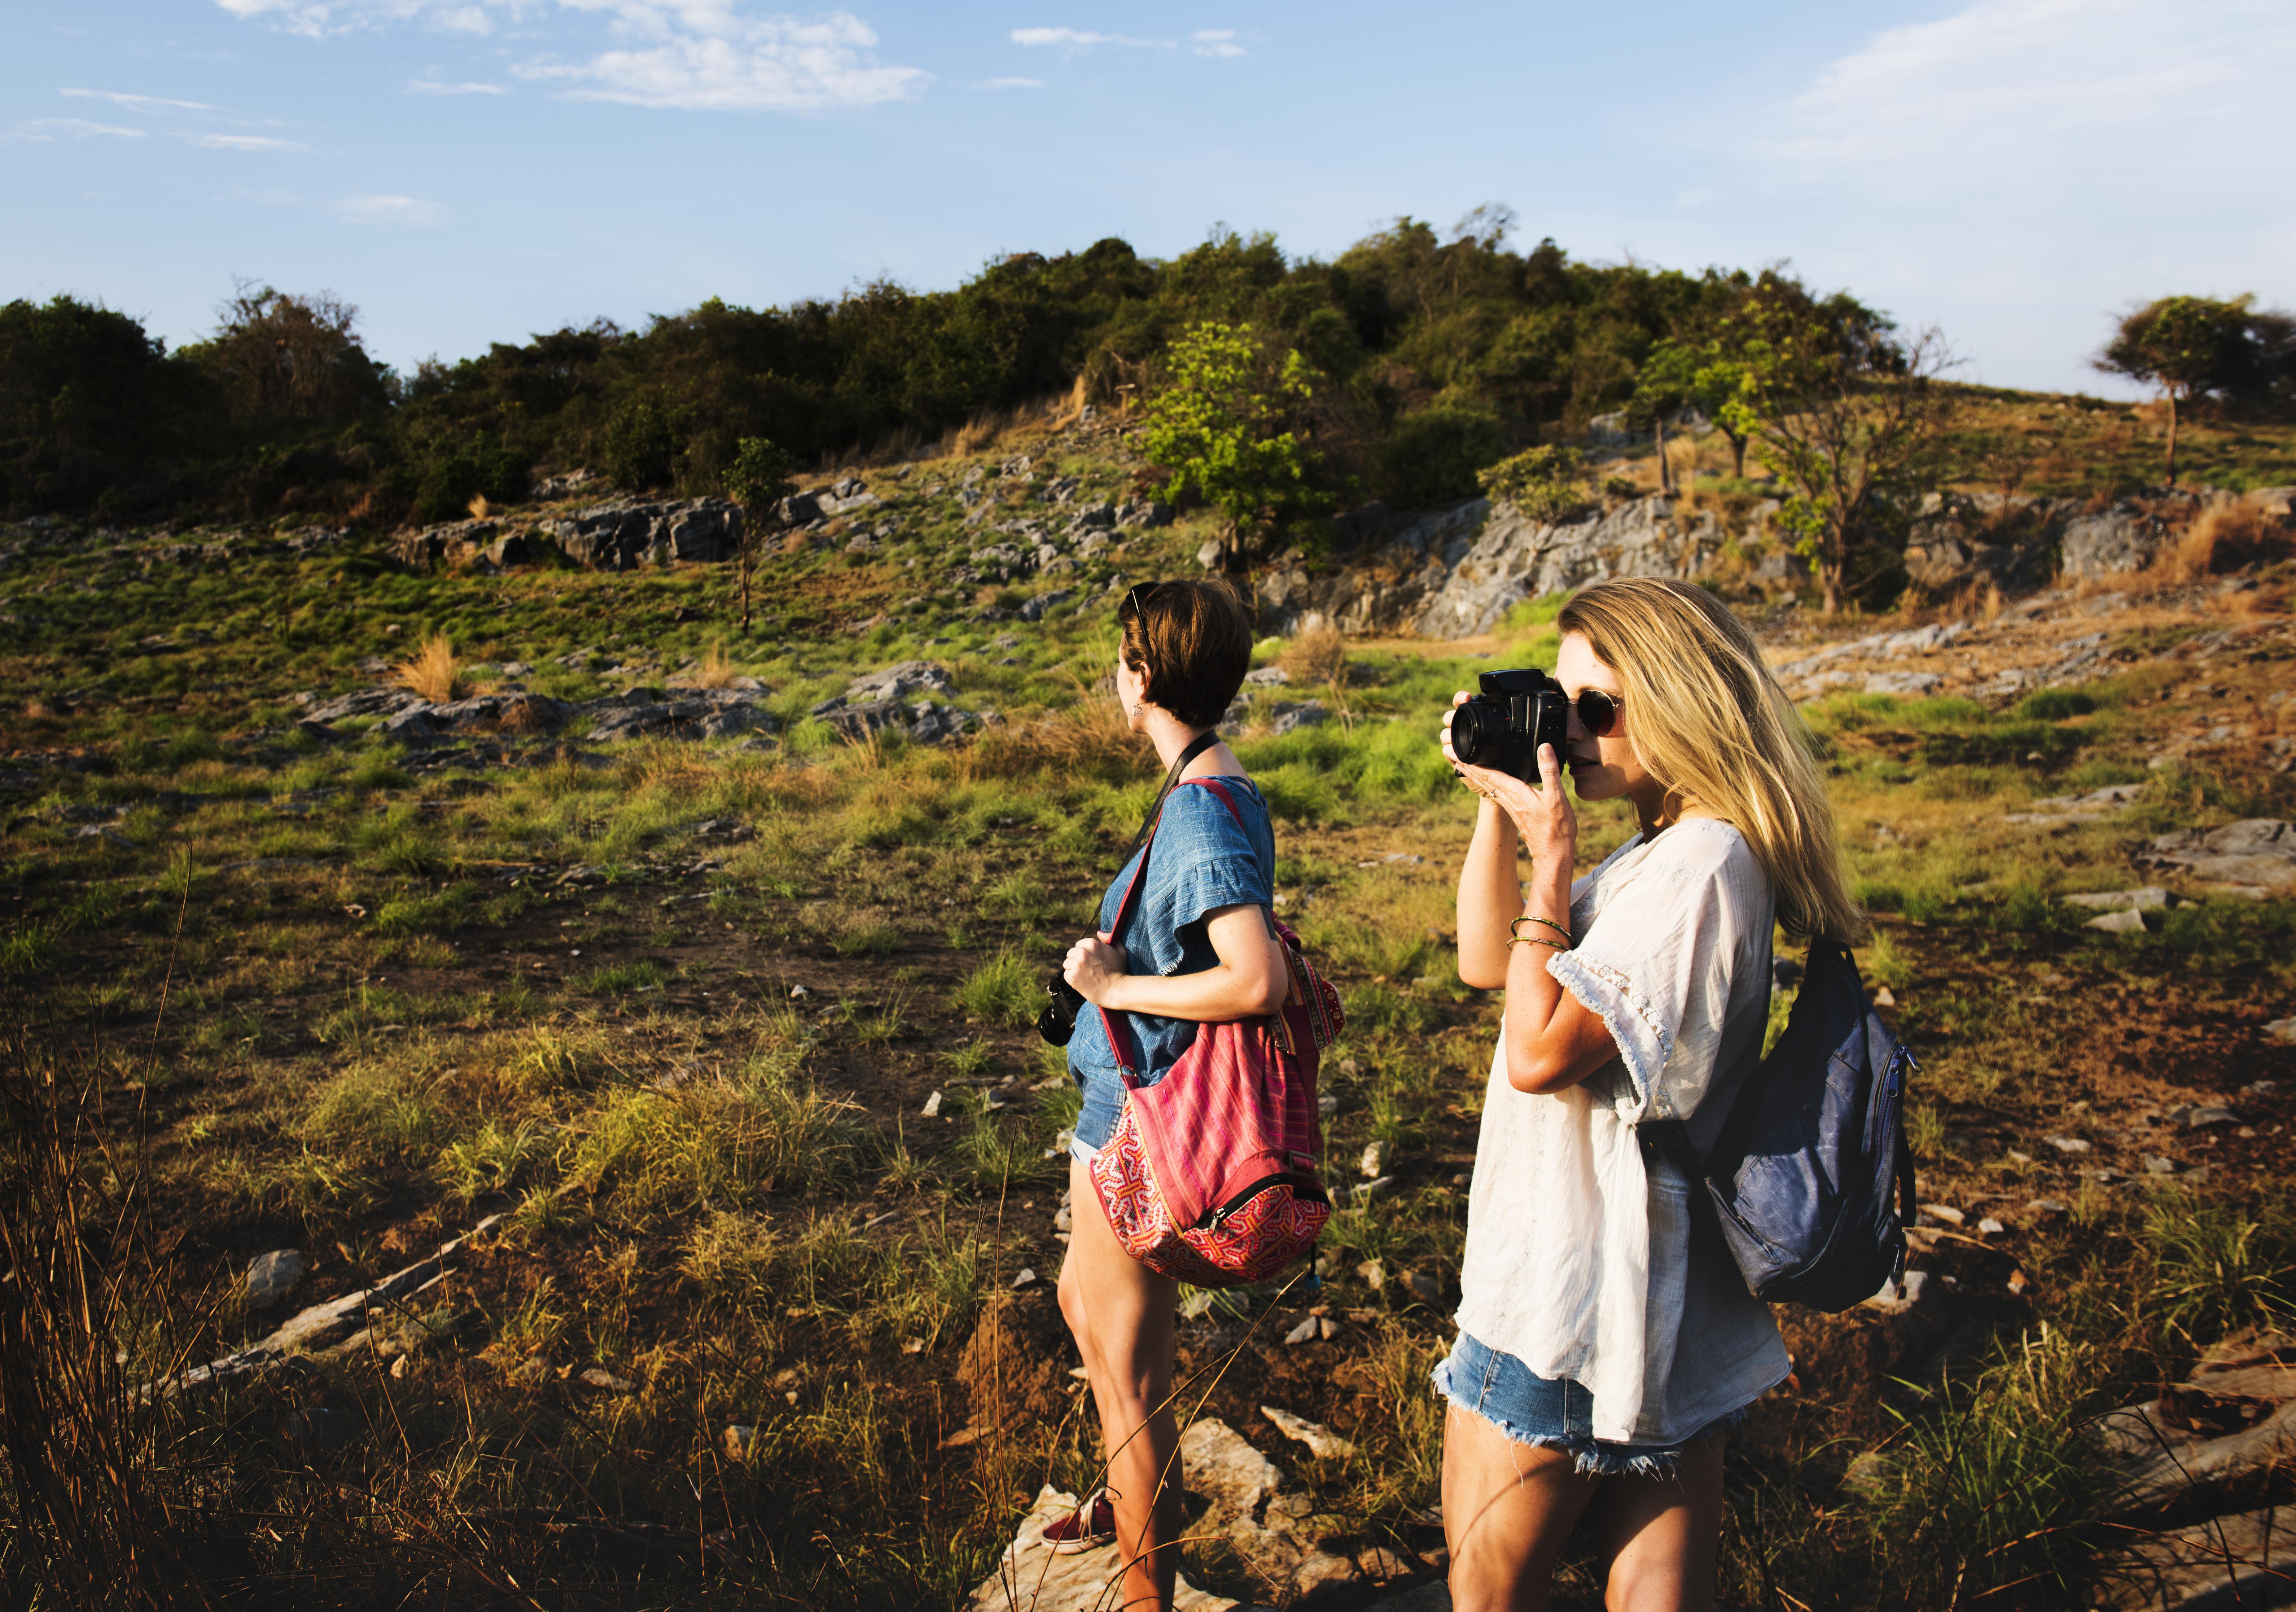 Responsible tourists want to travel while minimising their environmental impact.